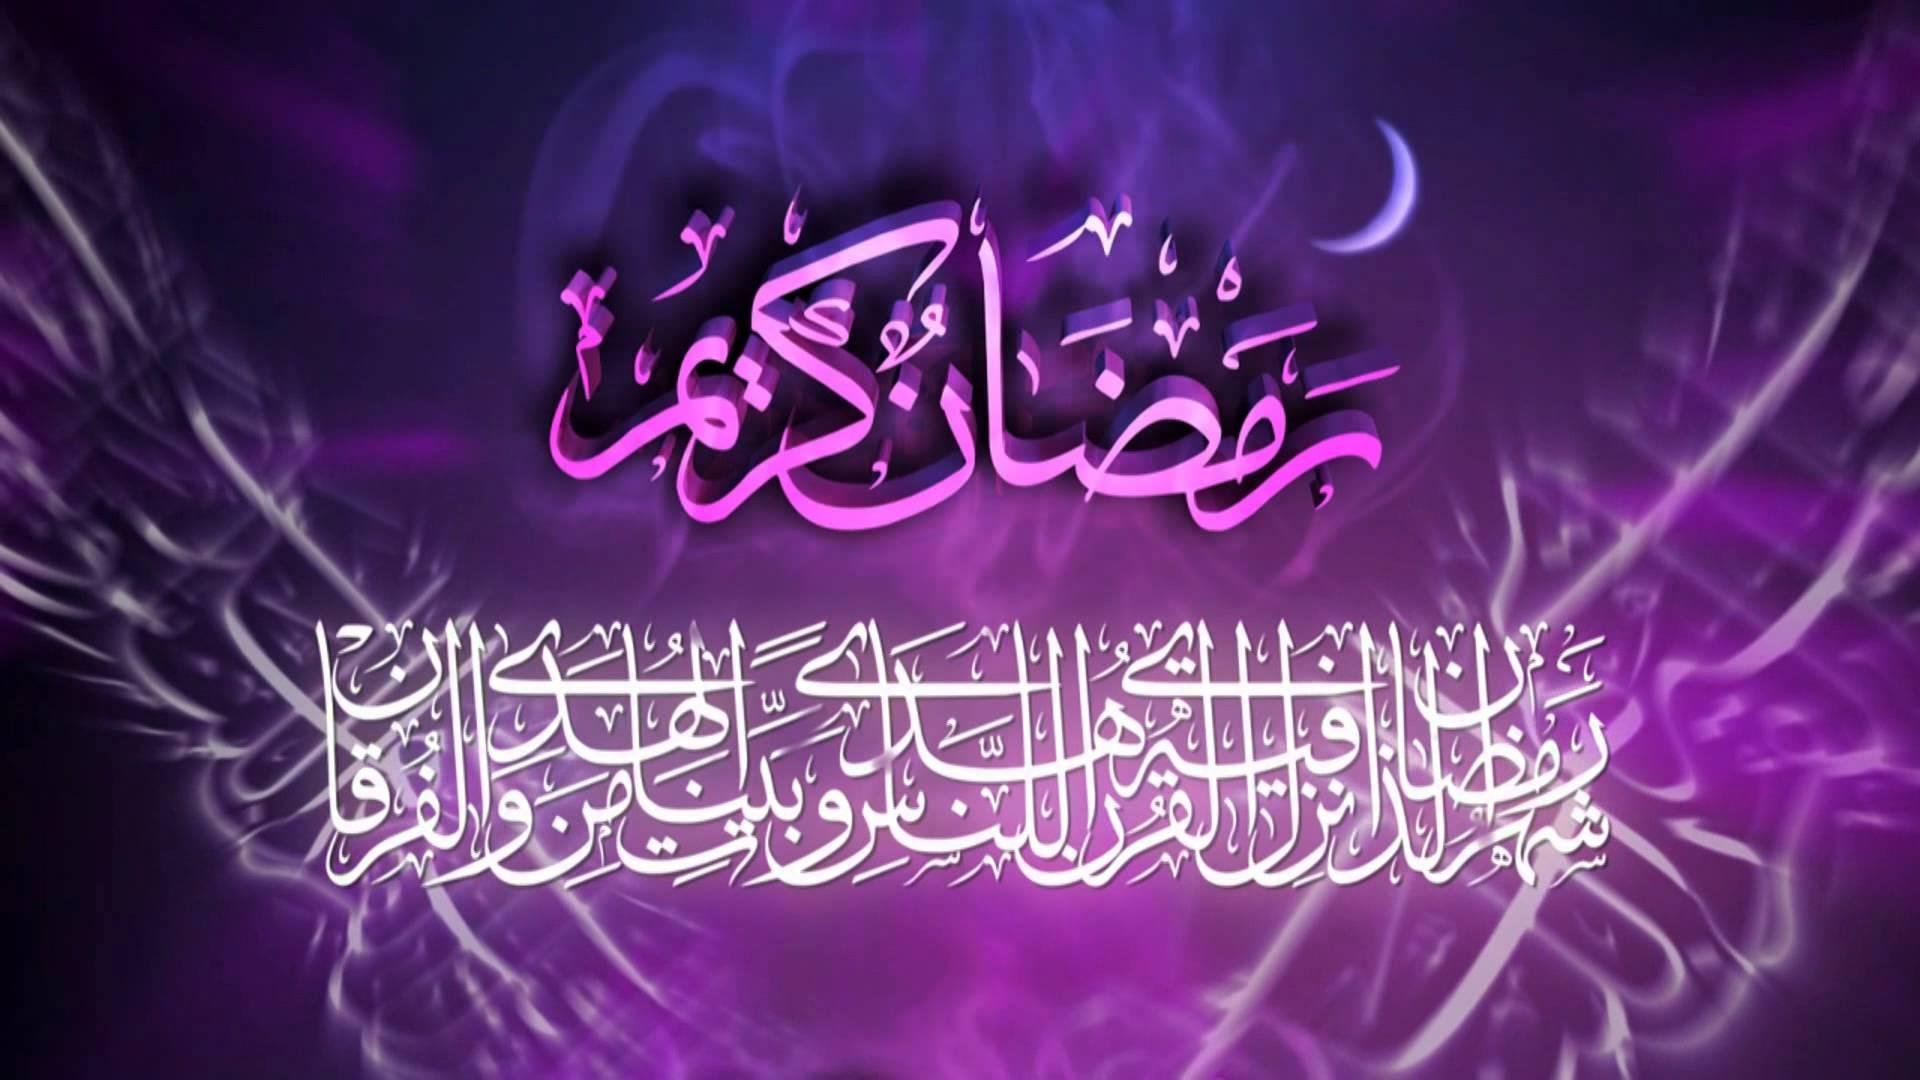 بالصور عبارات عن رمضان , انقى الكلمات عن رمضان 5261 2